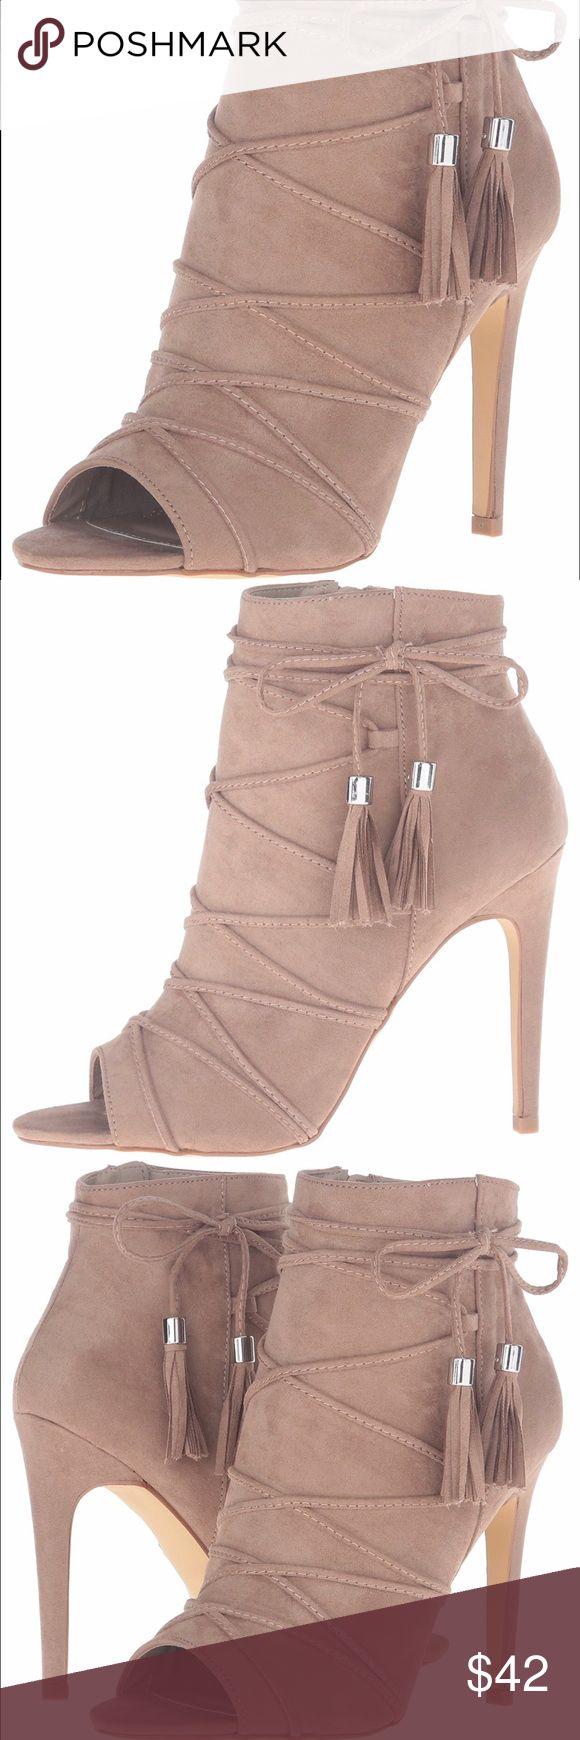 Steve Madden Bootie Brand New Nude Peep Toe Bootie. Zip up detail. Size 8.5 Steve Madden Shoes Heels